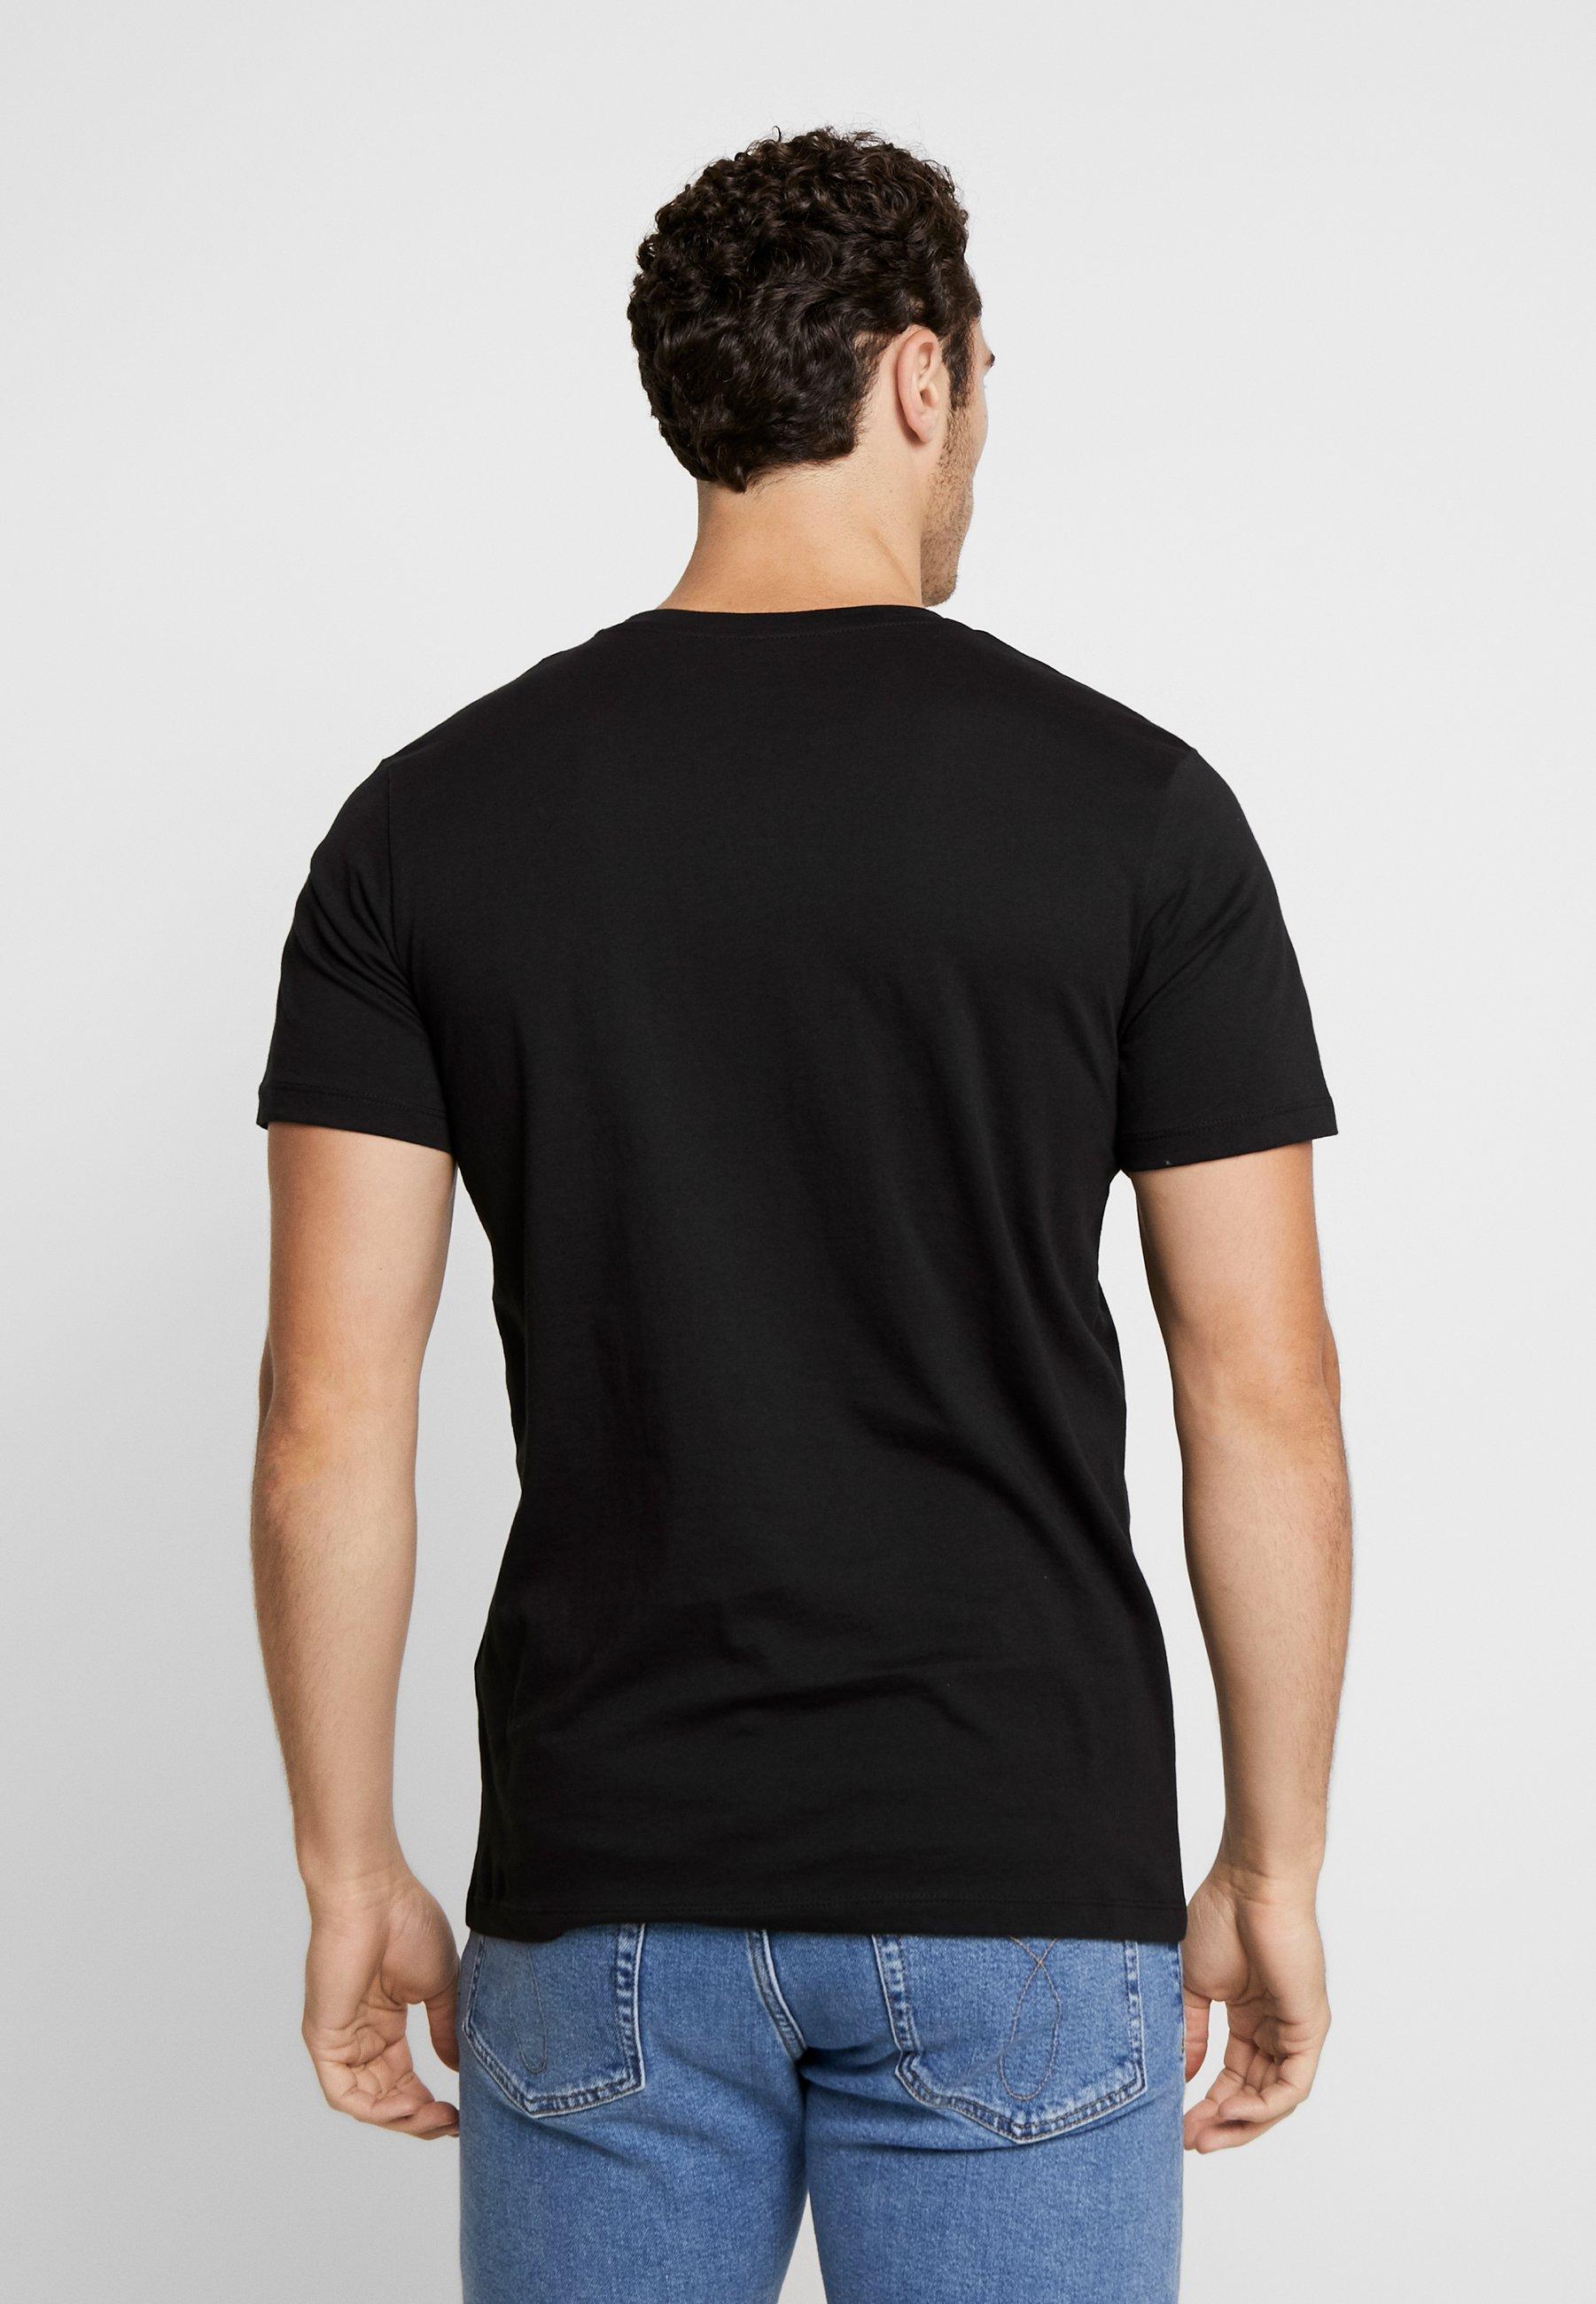 shirt Tee Jormelting NeckT Jones Jackamp; Crew Imprimé Black Yb7f6gy